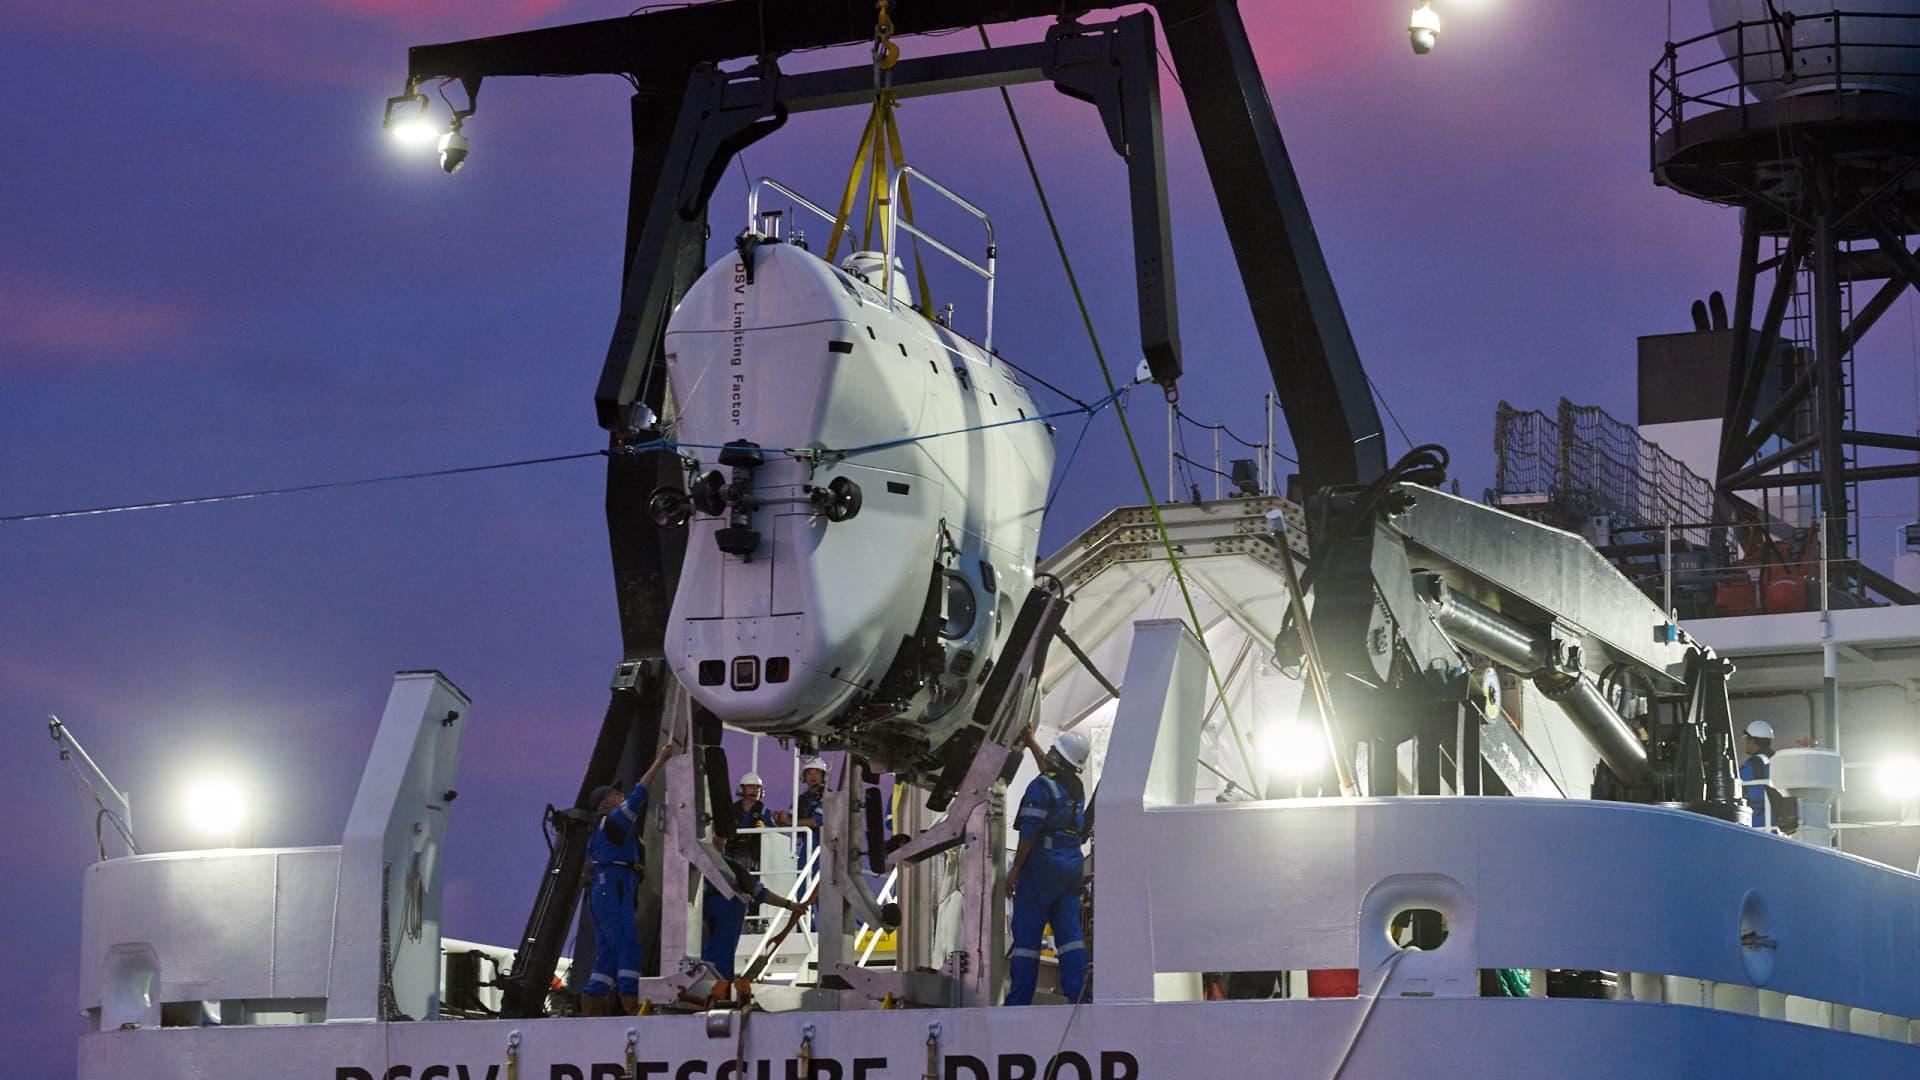 Deep ocean submarine DSV Limiting Factor is seen above the deck of the ship DSSV Pressure Drop.